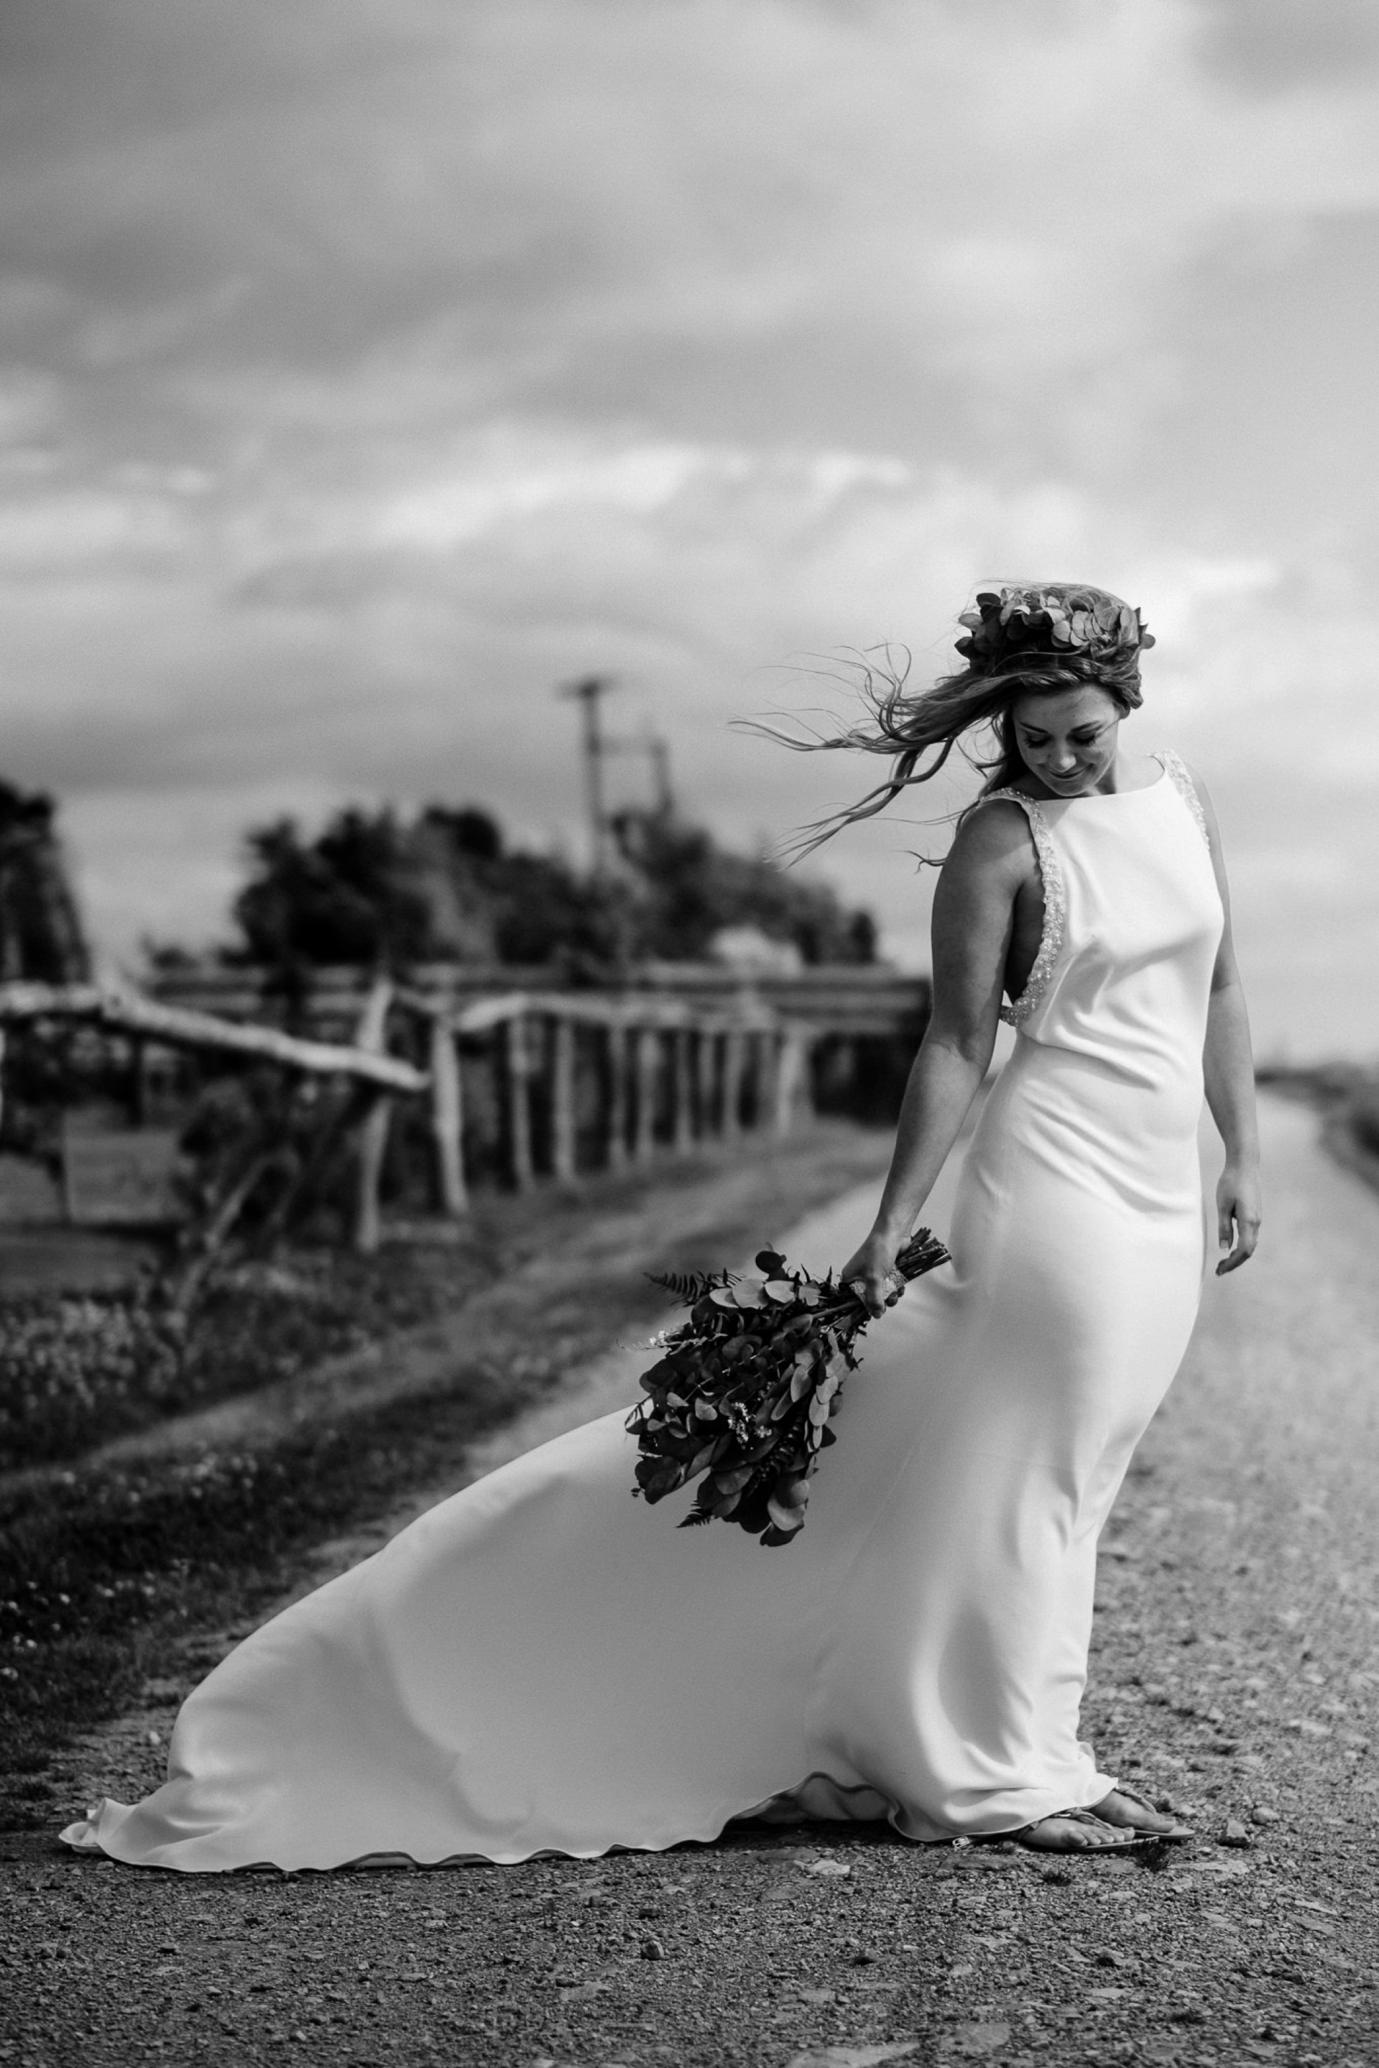 20170624_euan robertson weddings_054_WEB.jpg